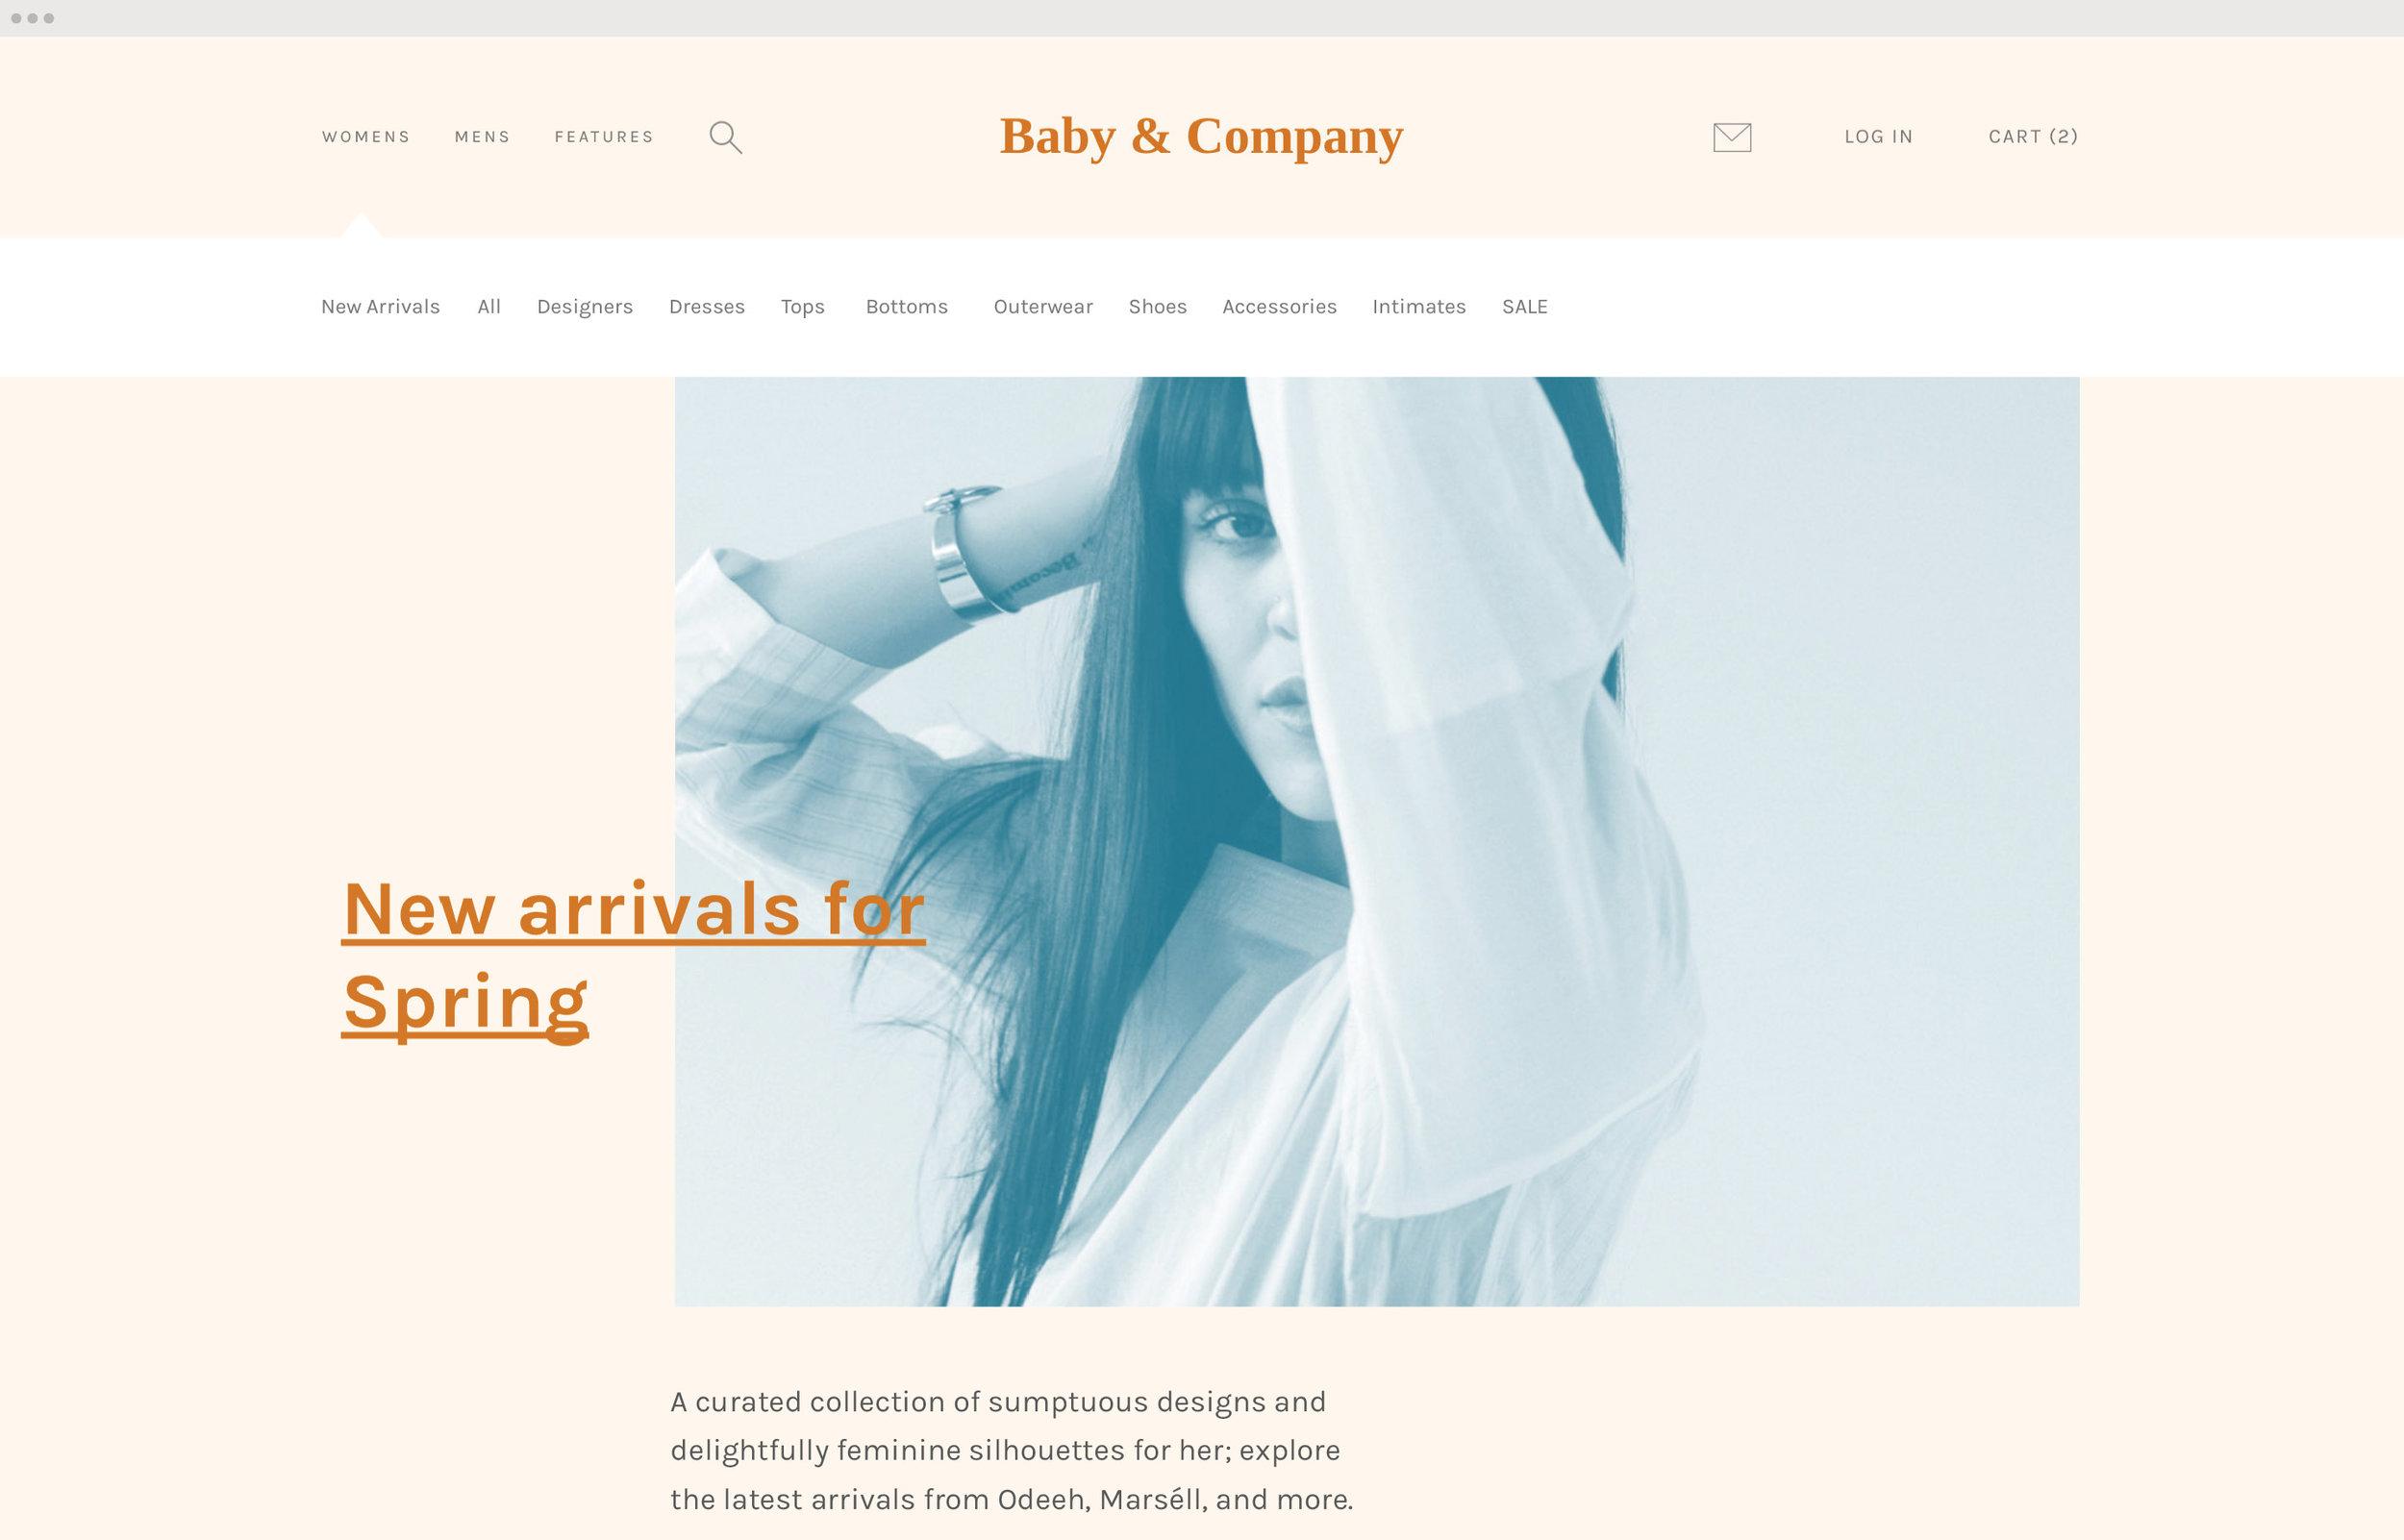 Web Tiles_2019_Web Design - B&C site customization4.jpg